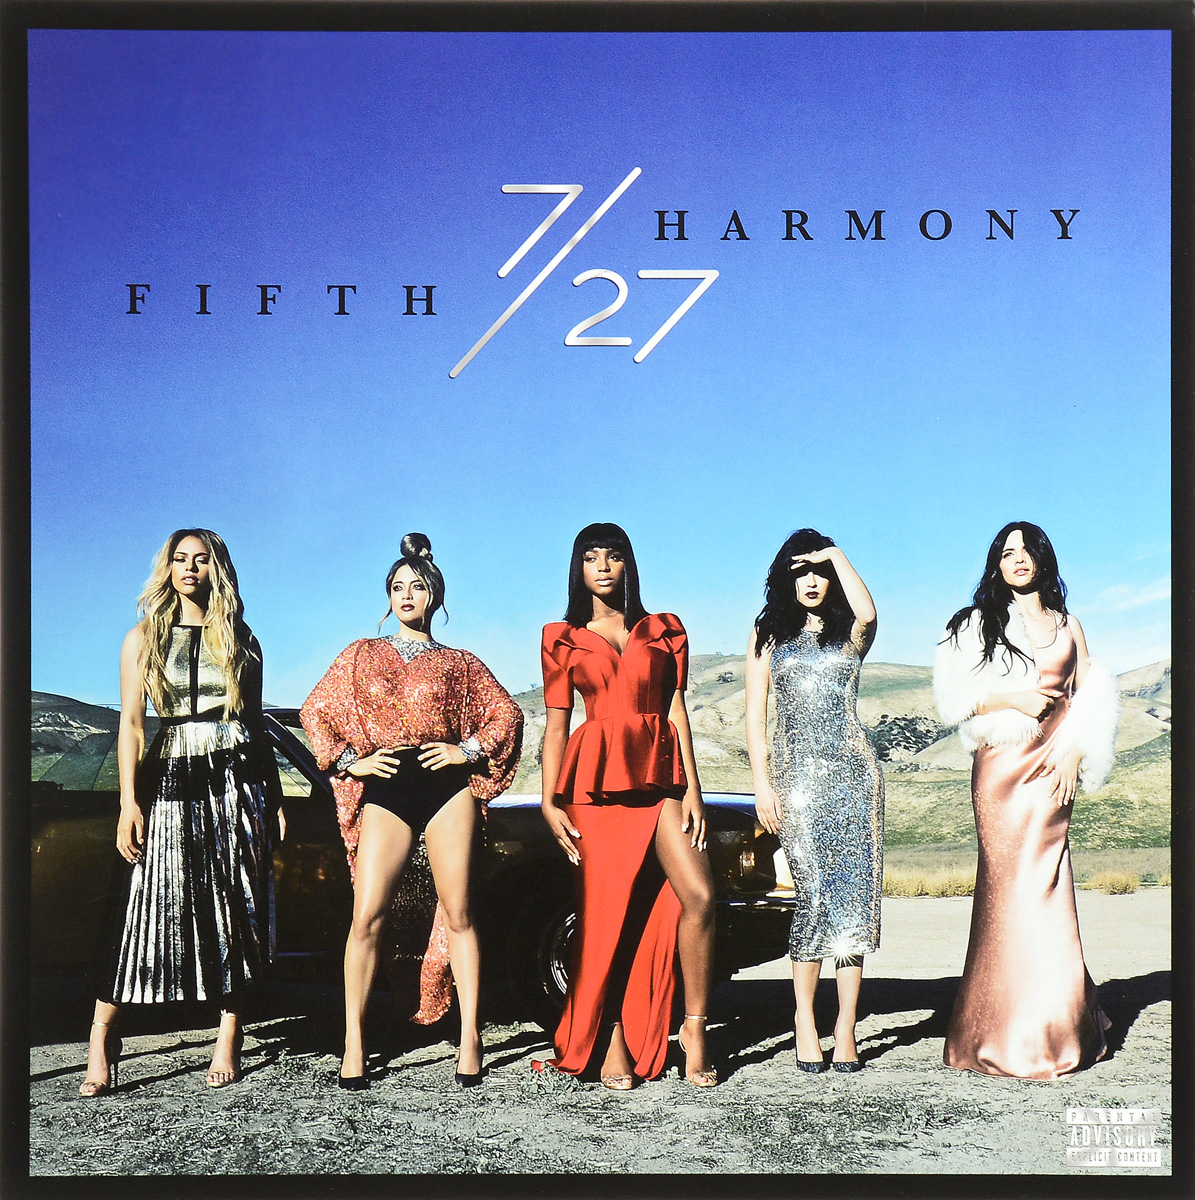 Fifth Harmony Fifth Harmony. 7 / 27 (LP) joyce didonato joyce didonato in war peace harmony through music 2 lp